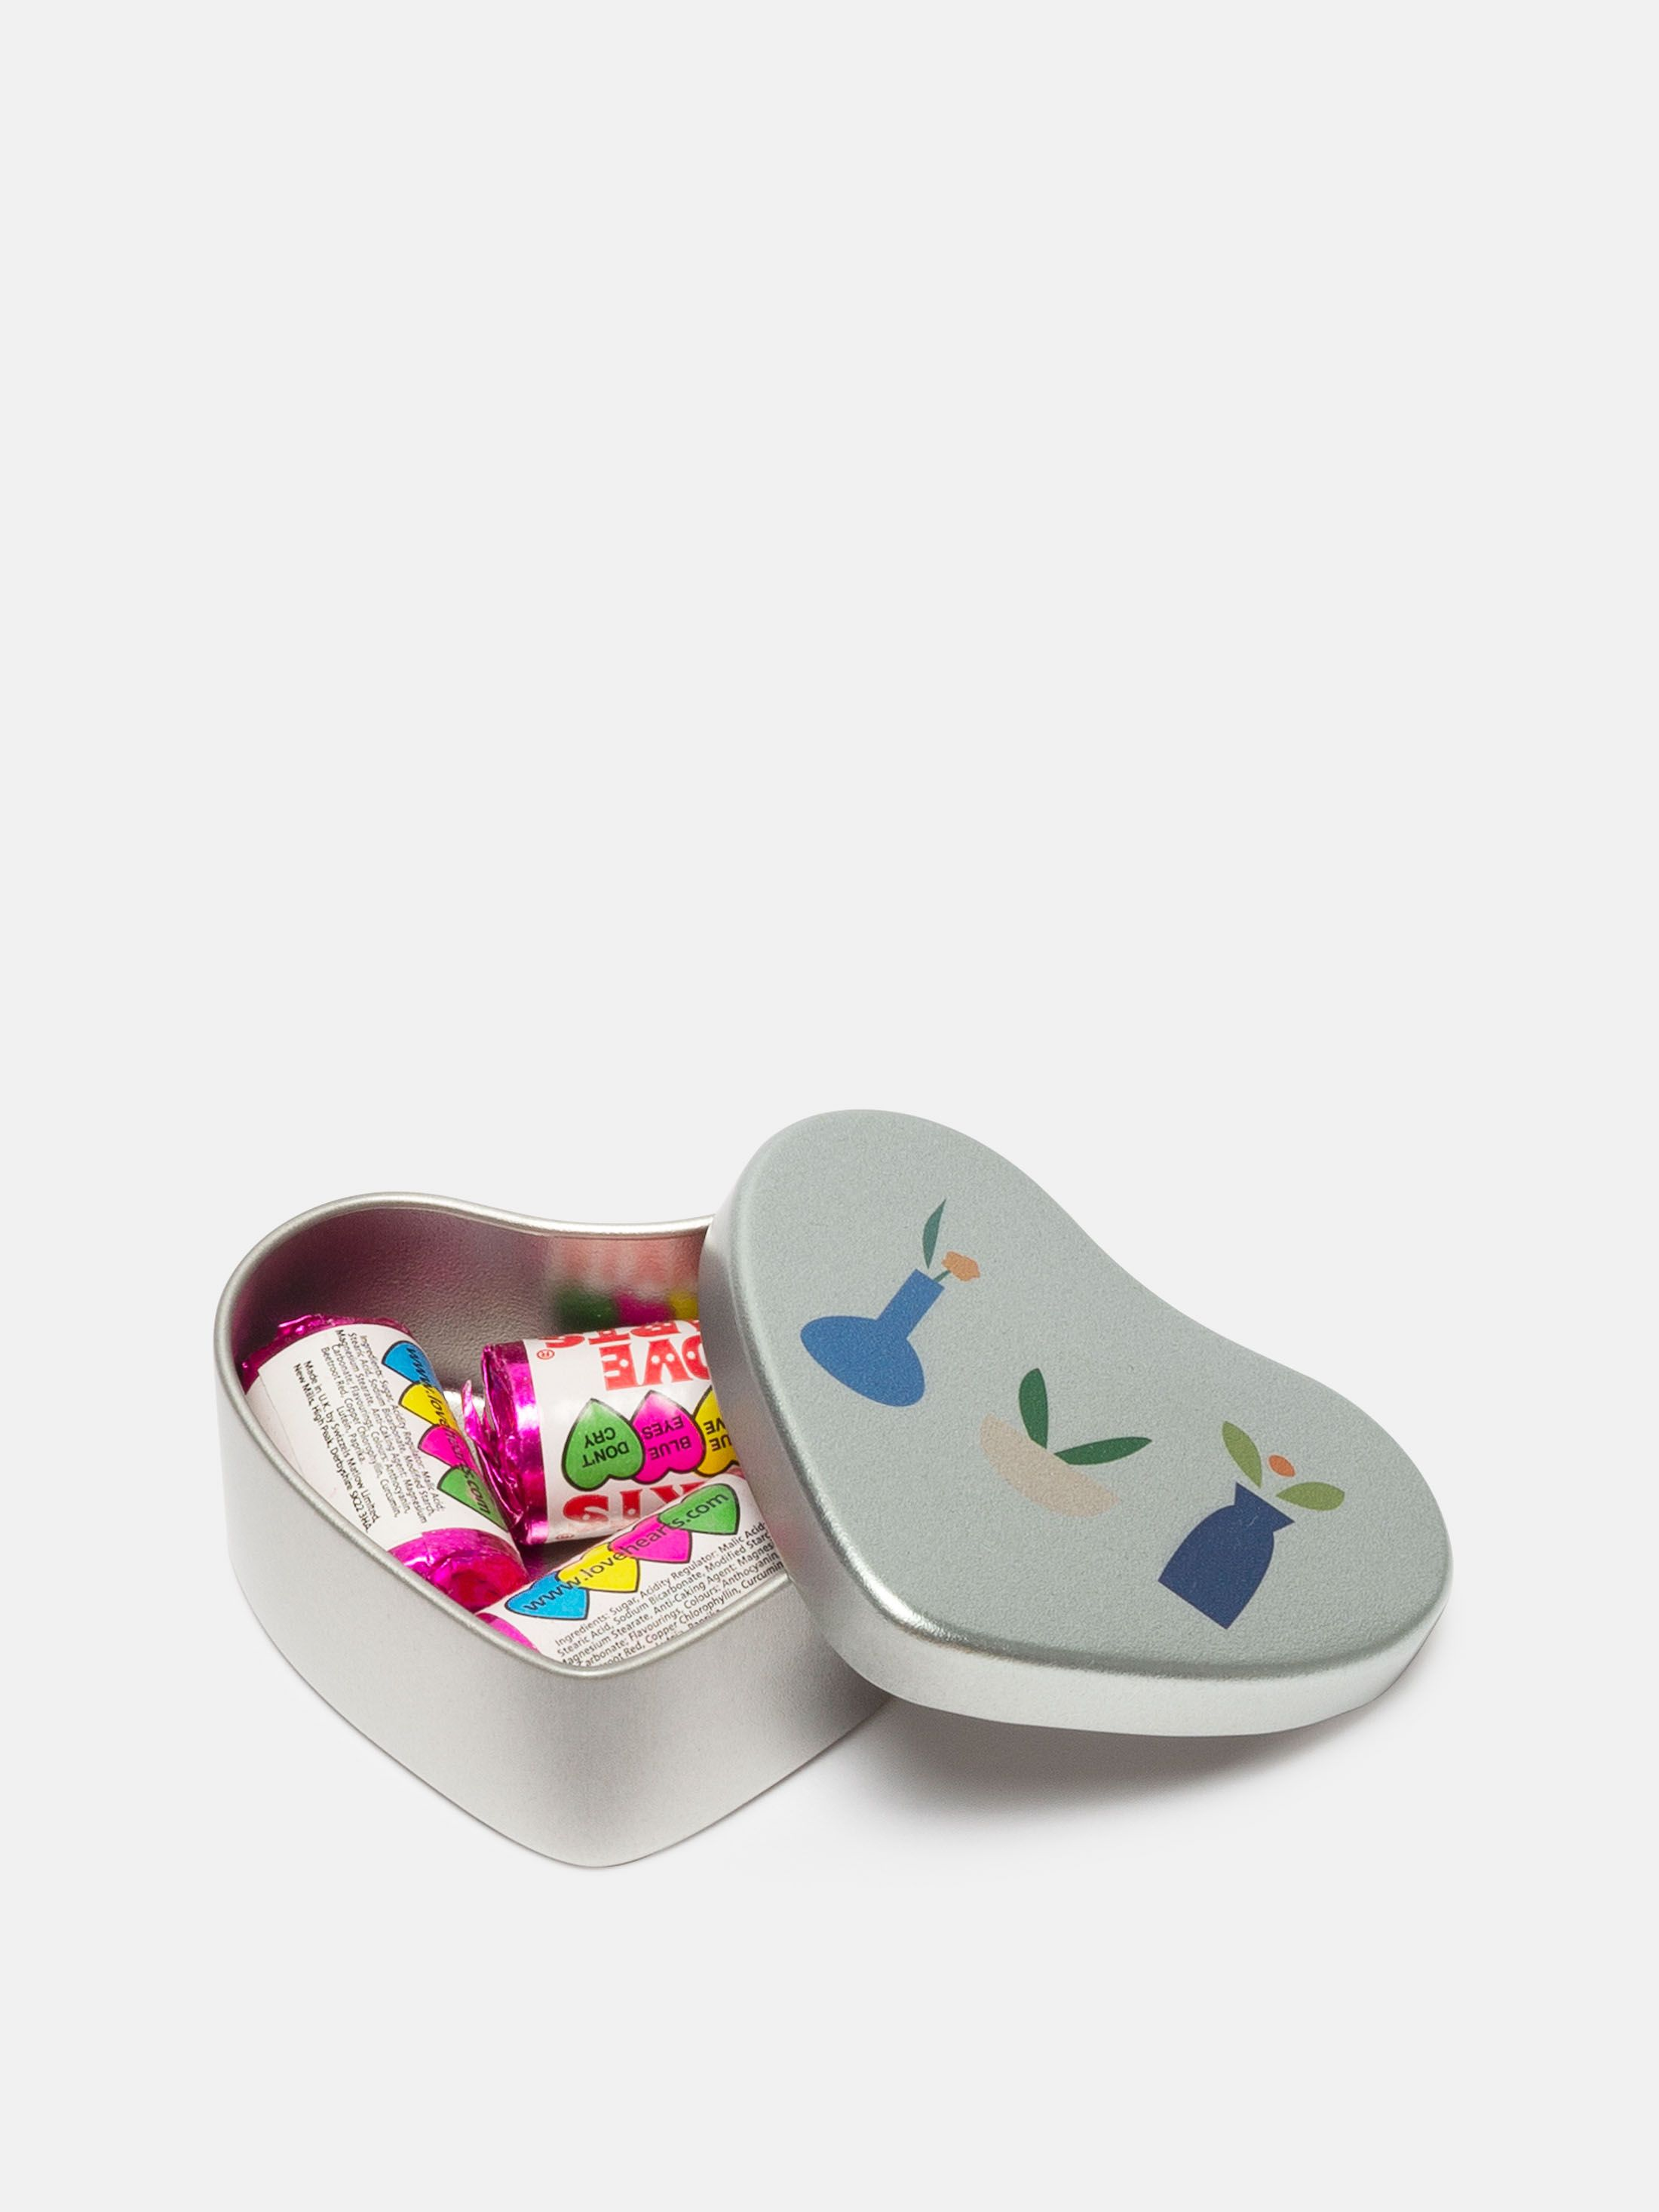 design a heart shaped tin